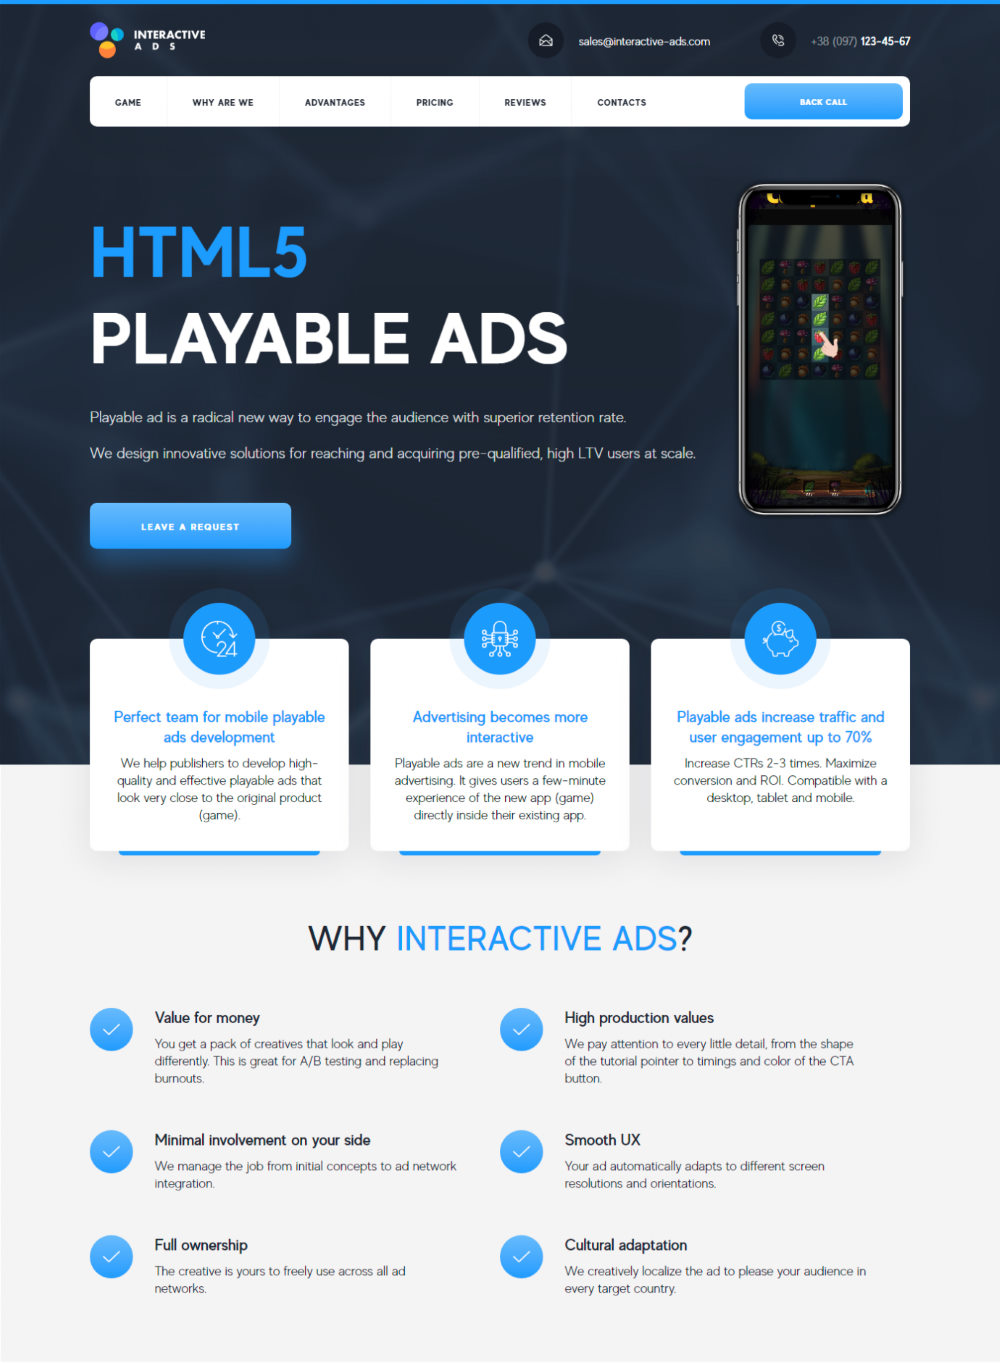 Разработка Лендинг Пейдж HTML5 Playable Ads